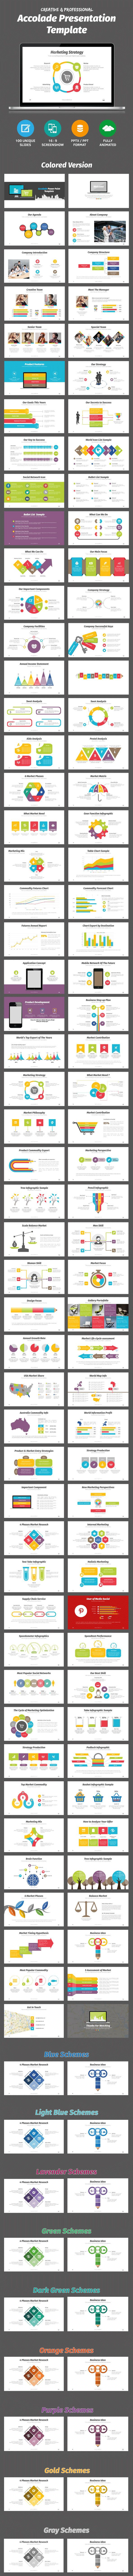 Accolade PowerPoint Presentation Template #design #slides Download: http://graphicriver.net/item/accolade-presentation-template/11450694?ref=ksioks